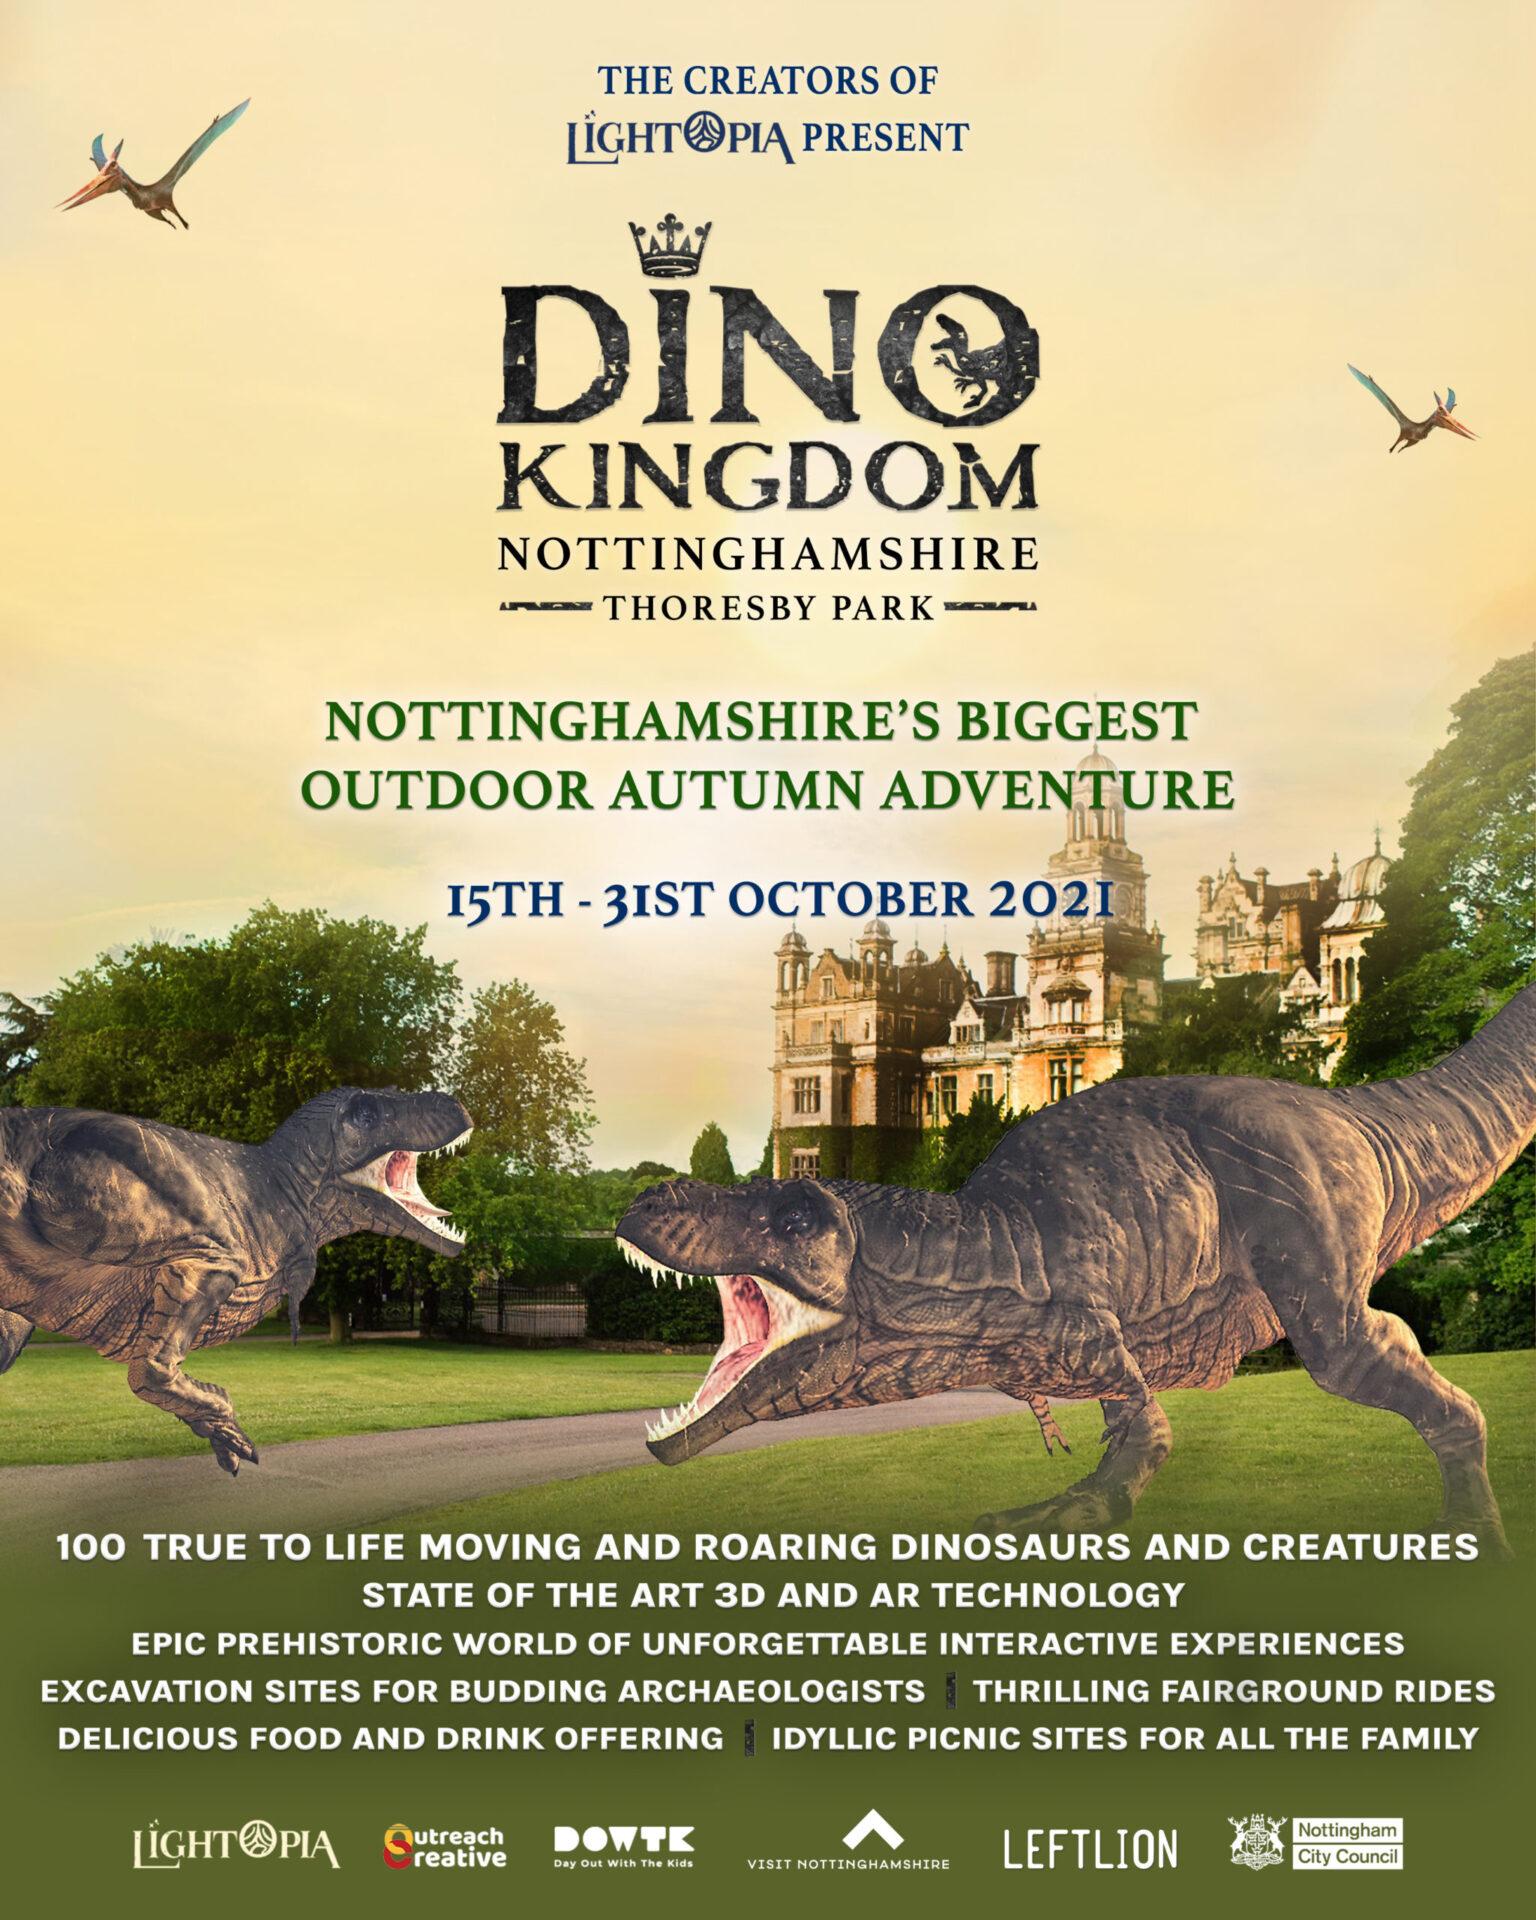 Dino Kingdom at Thoresby Park